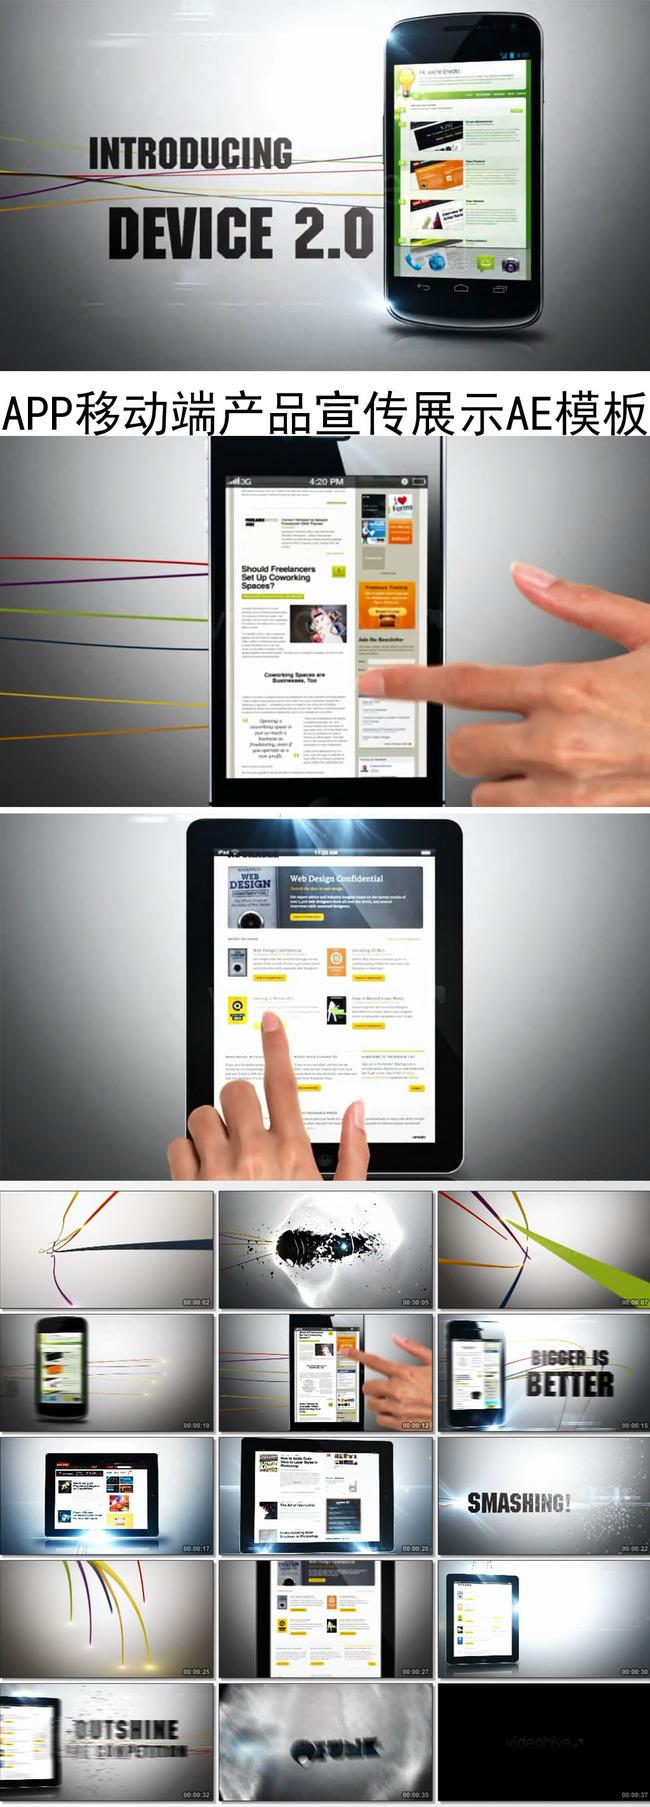 app移动端产品宣传展示ae模板